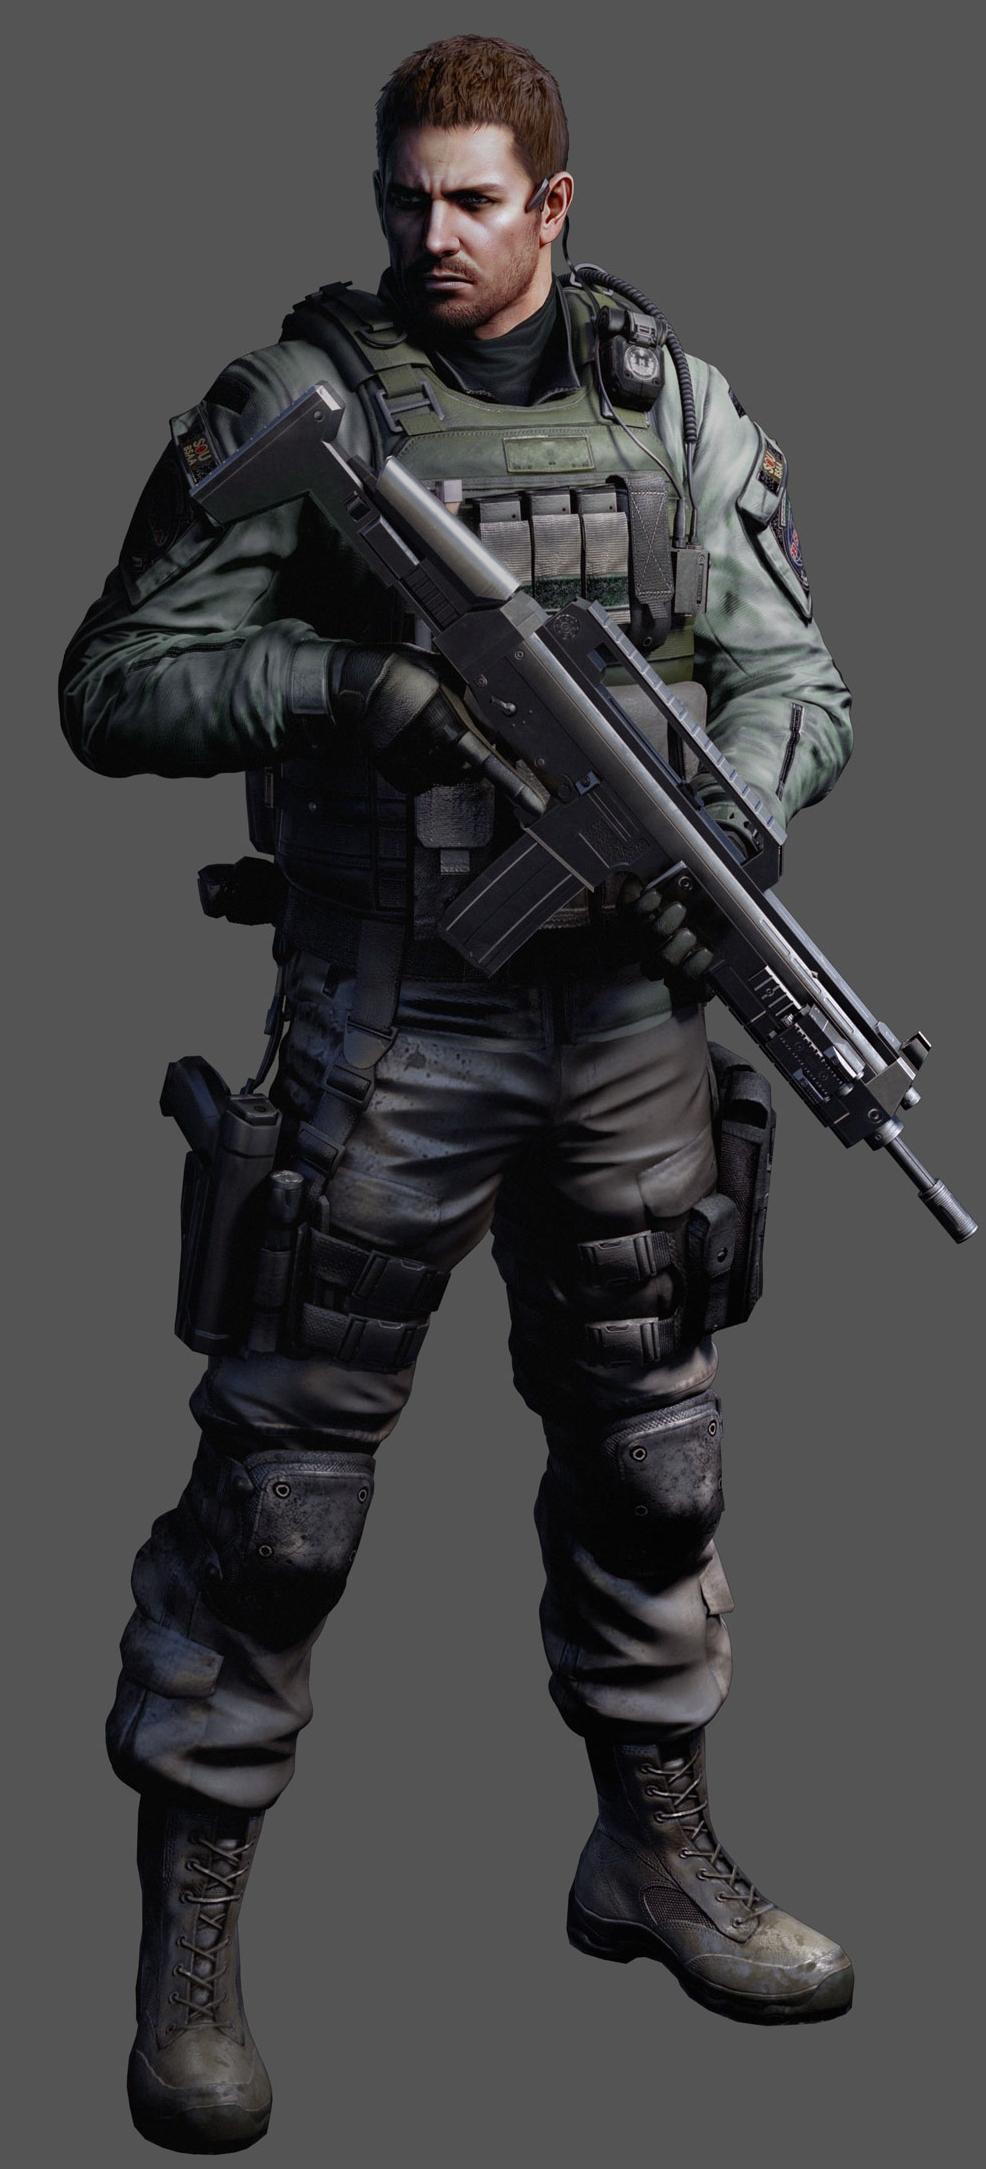 Resident Evil Bsaa Logo The Standard Bsaa Uniform